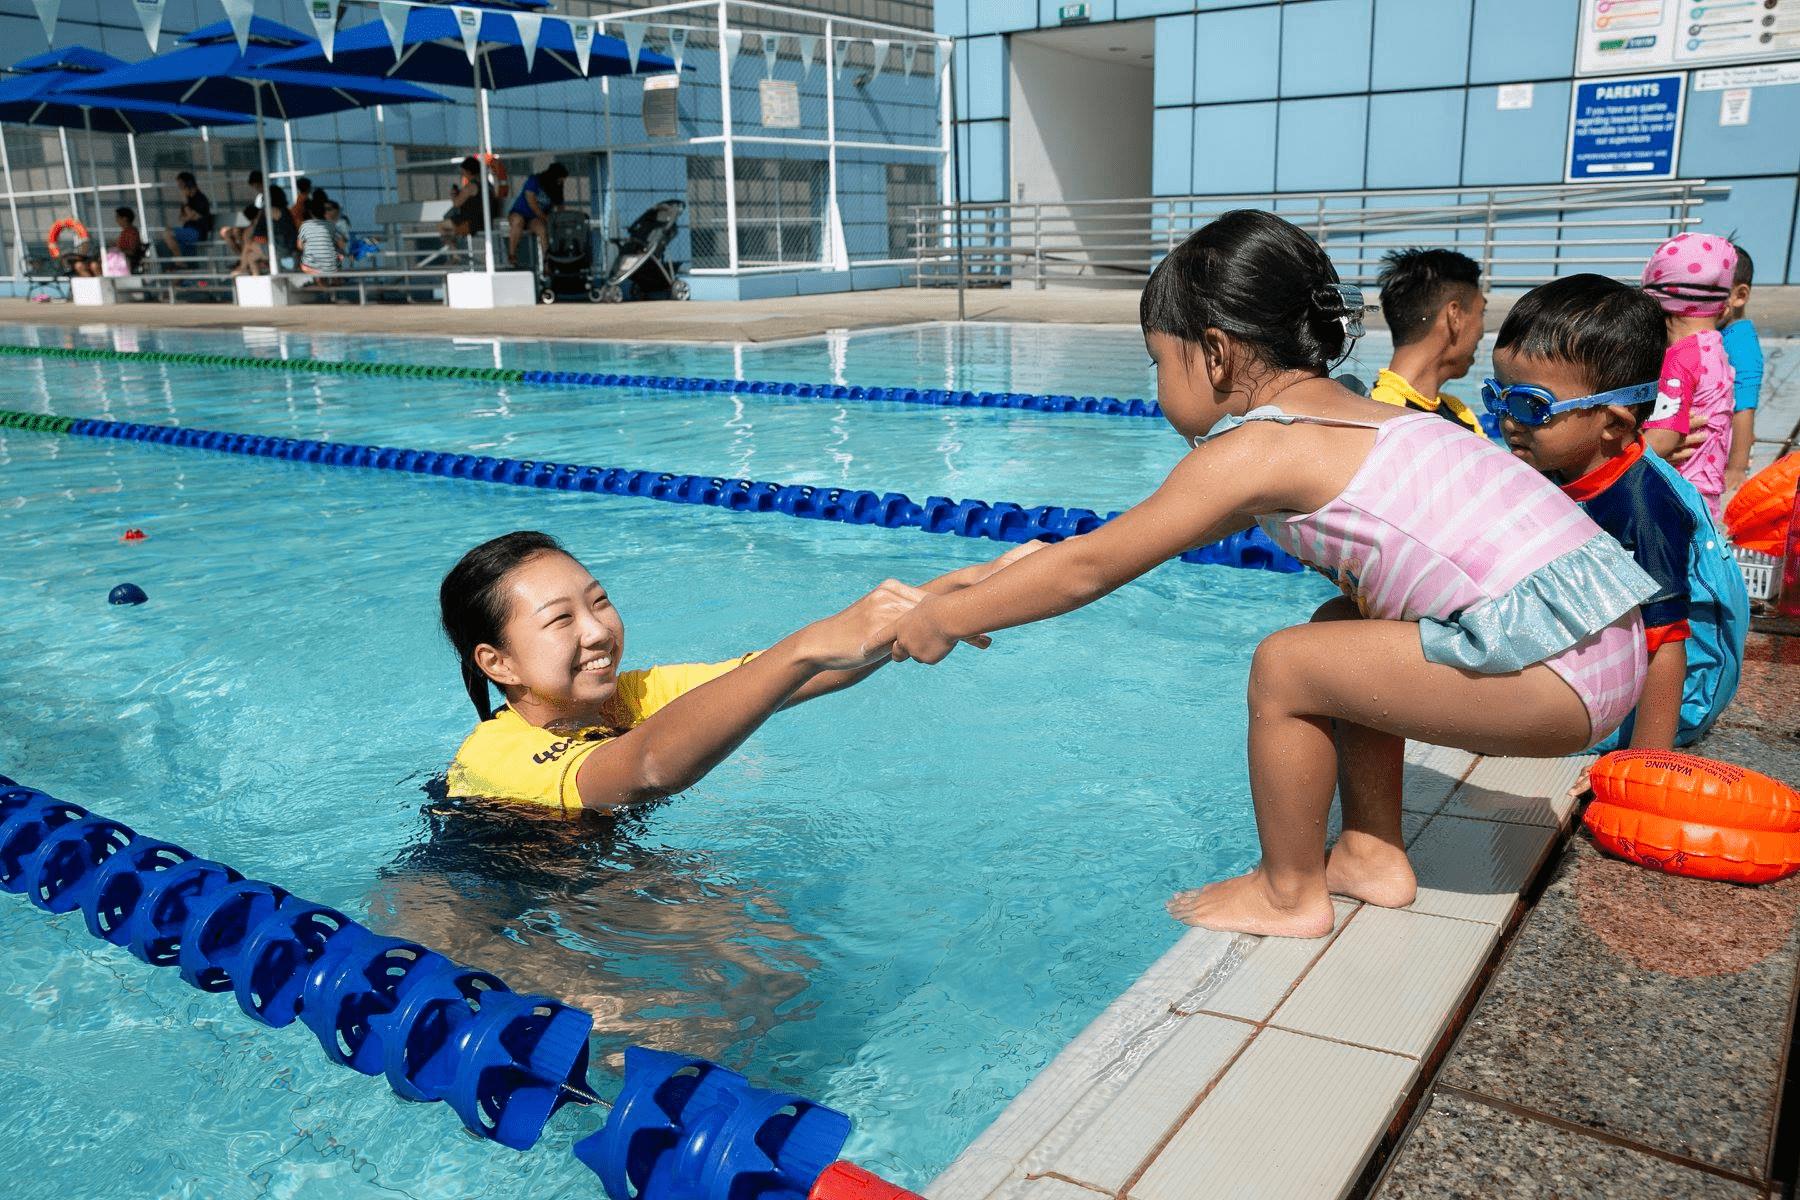 Swimming-Lessons-In-Singapore - state swim